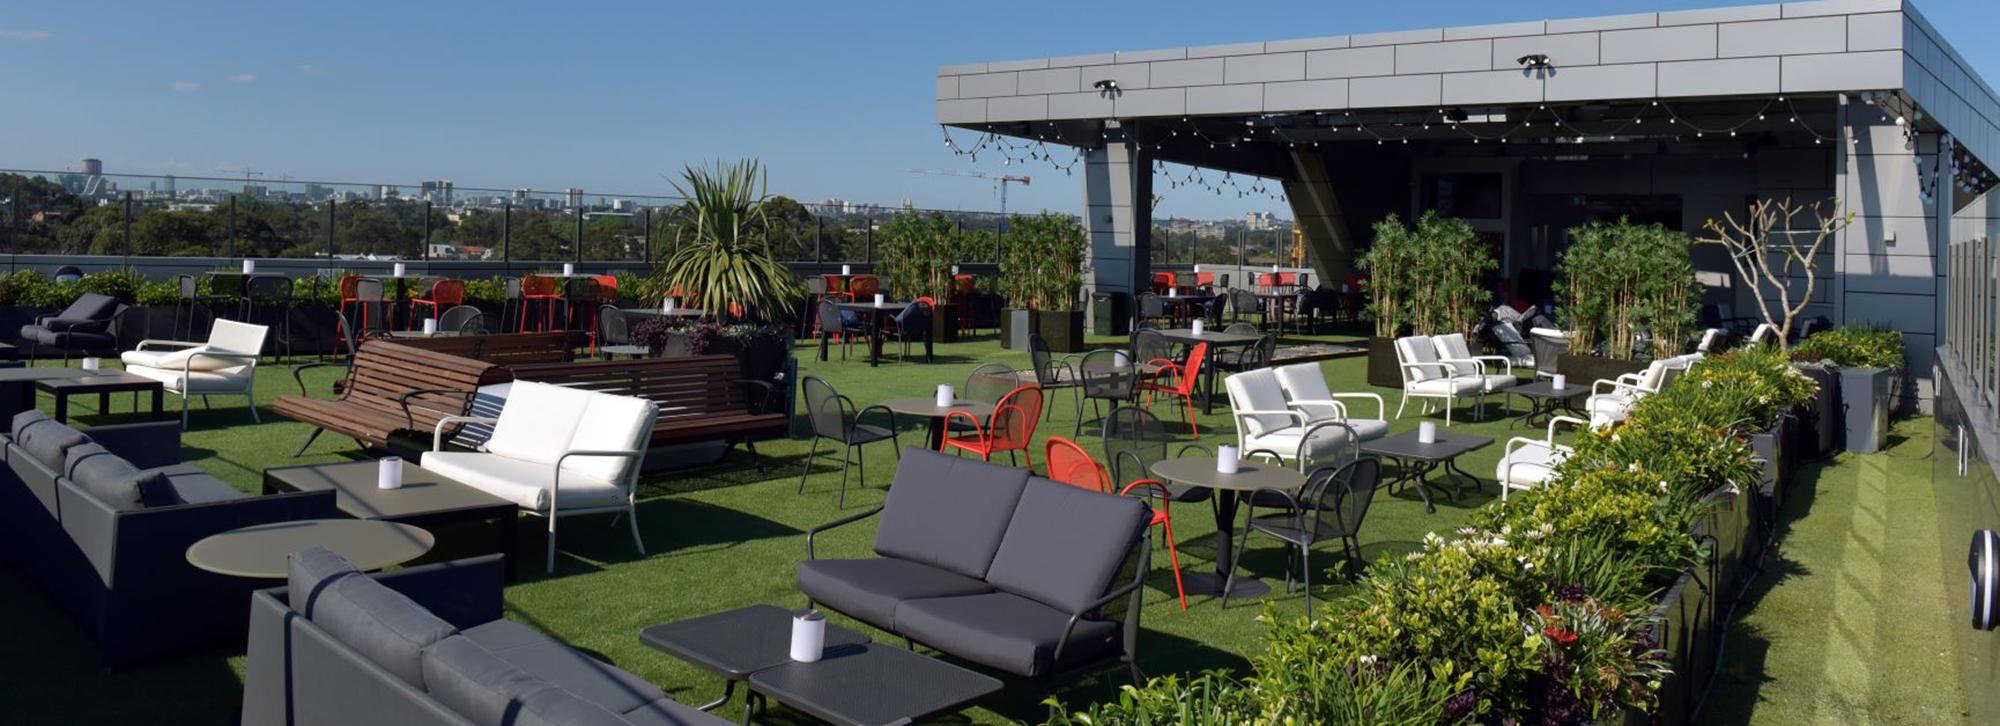 Rooftop Garden and Bar